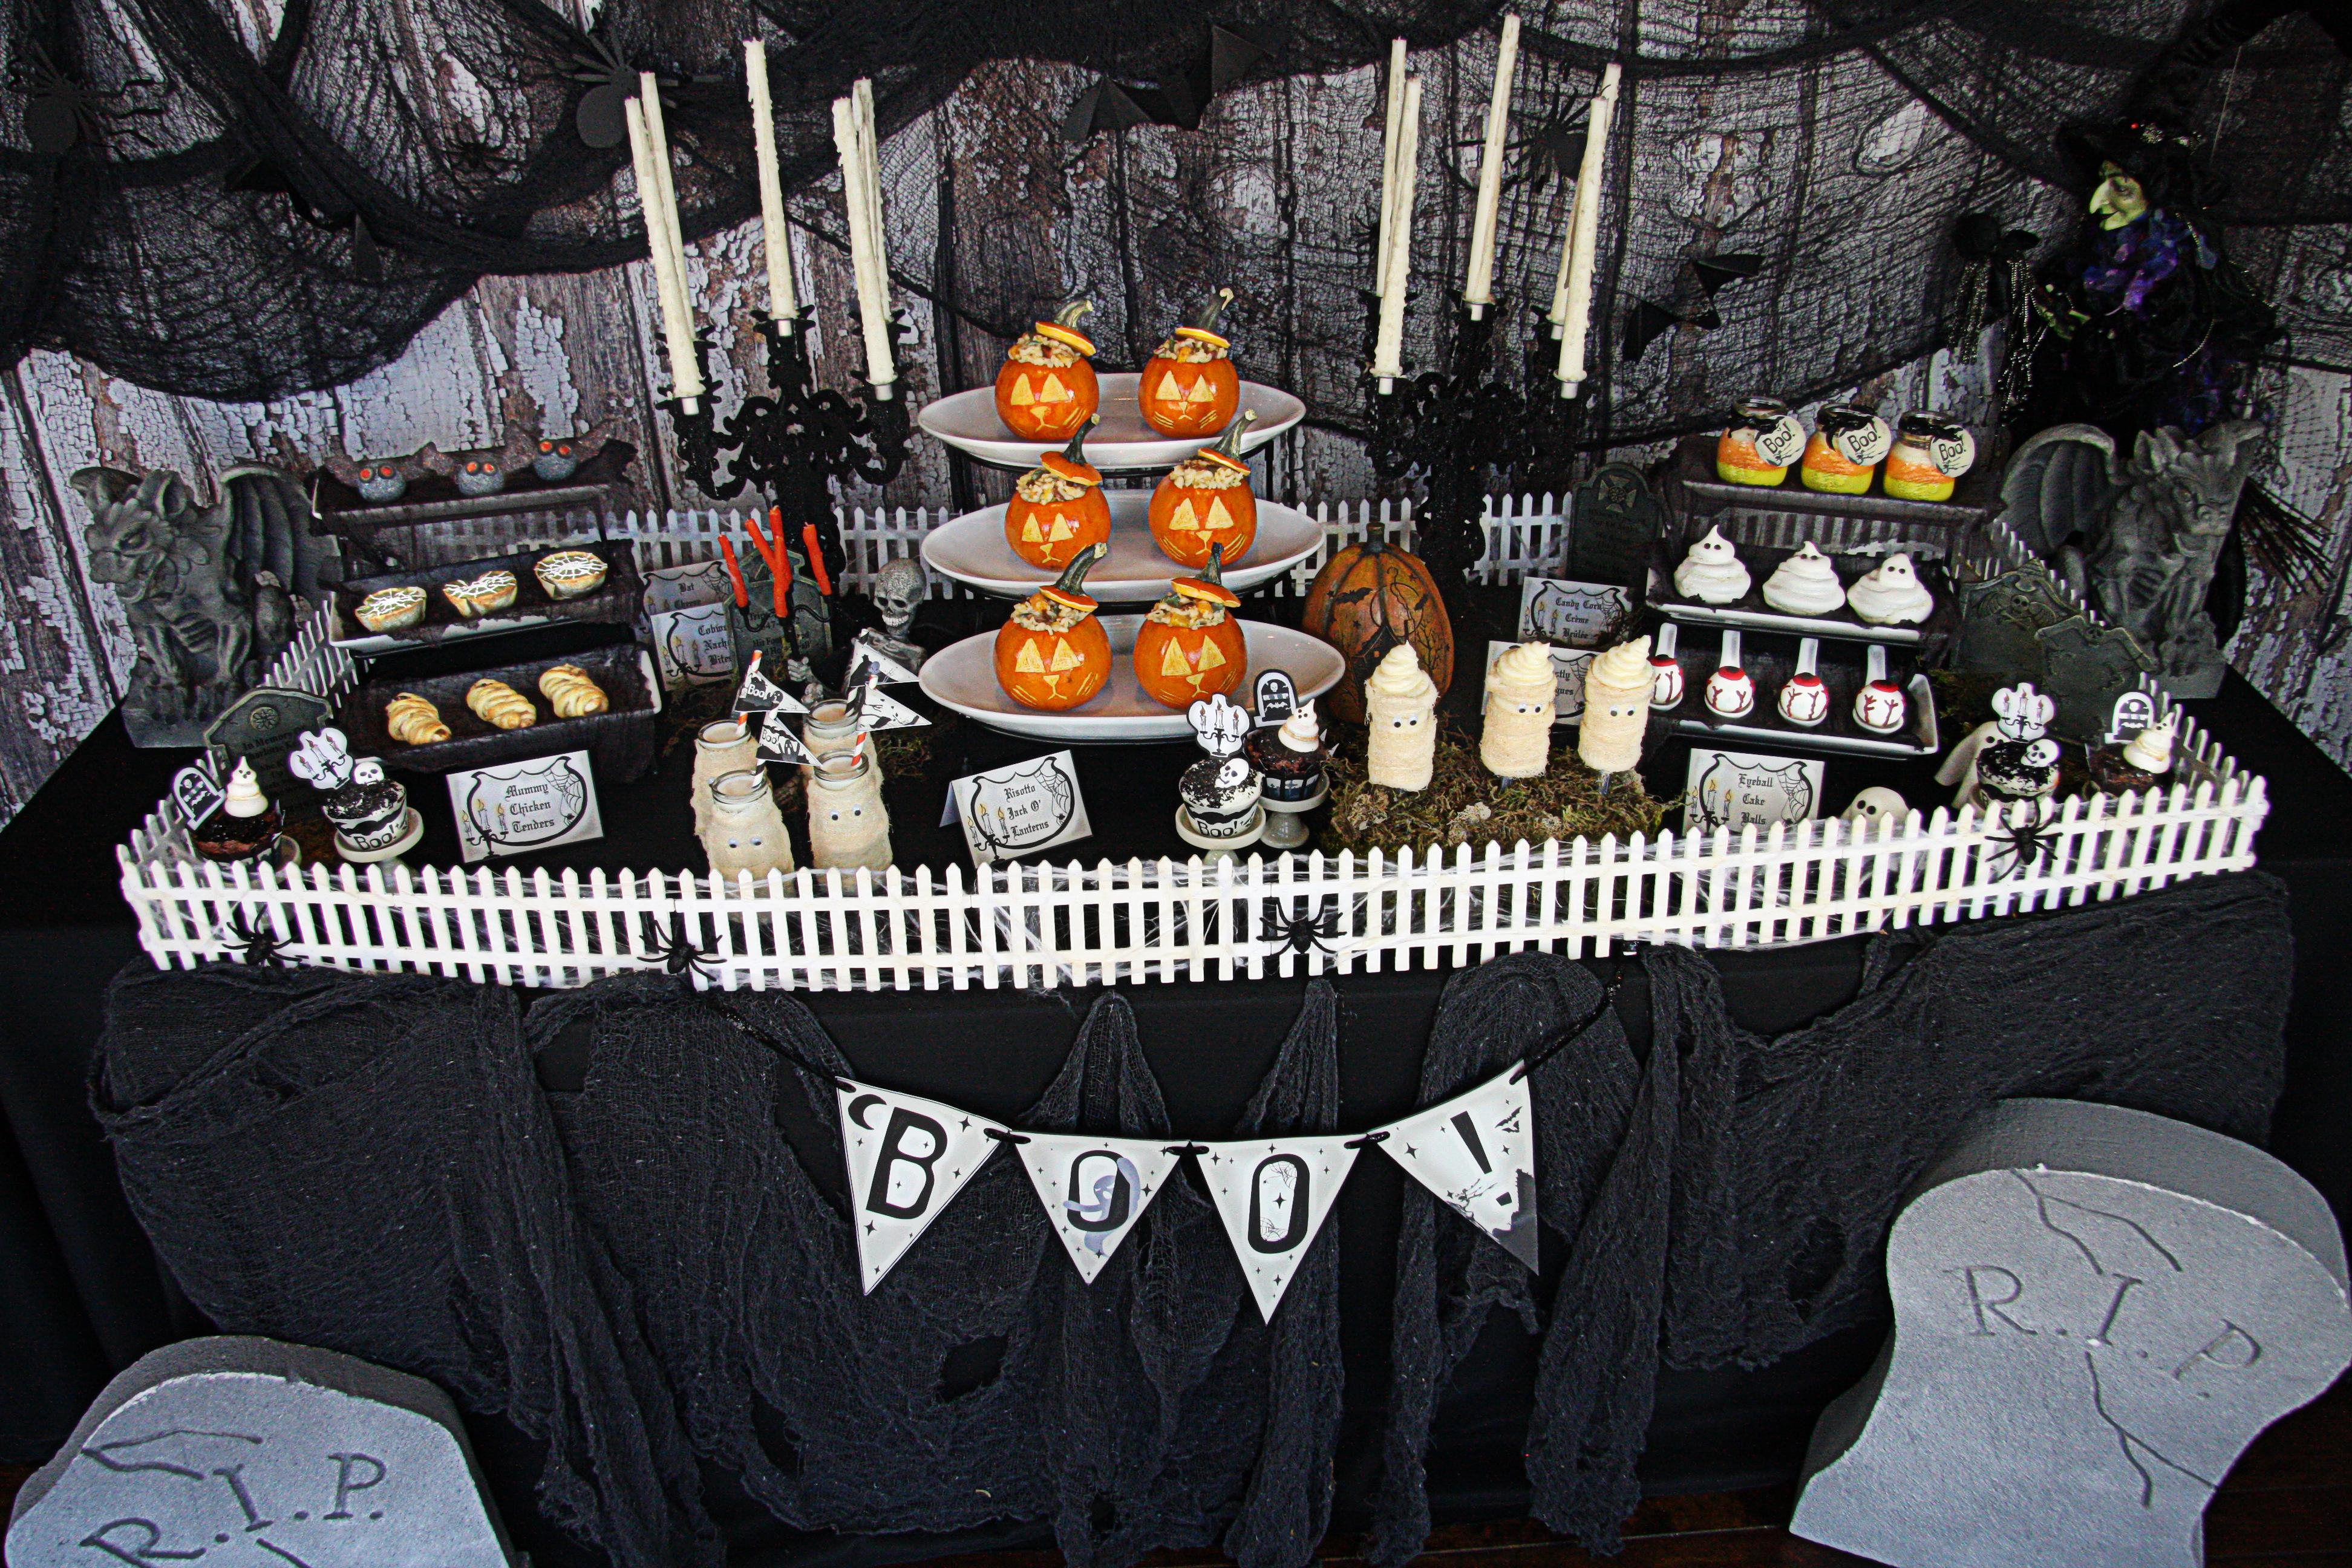 Garlic and herb cheese ball halloween bats the hopeless housewife the hopeless housewife - Childrens halloween decorations ...